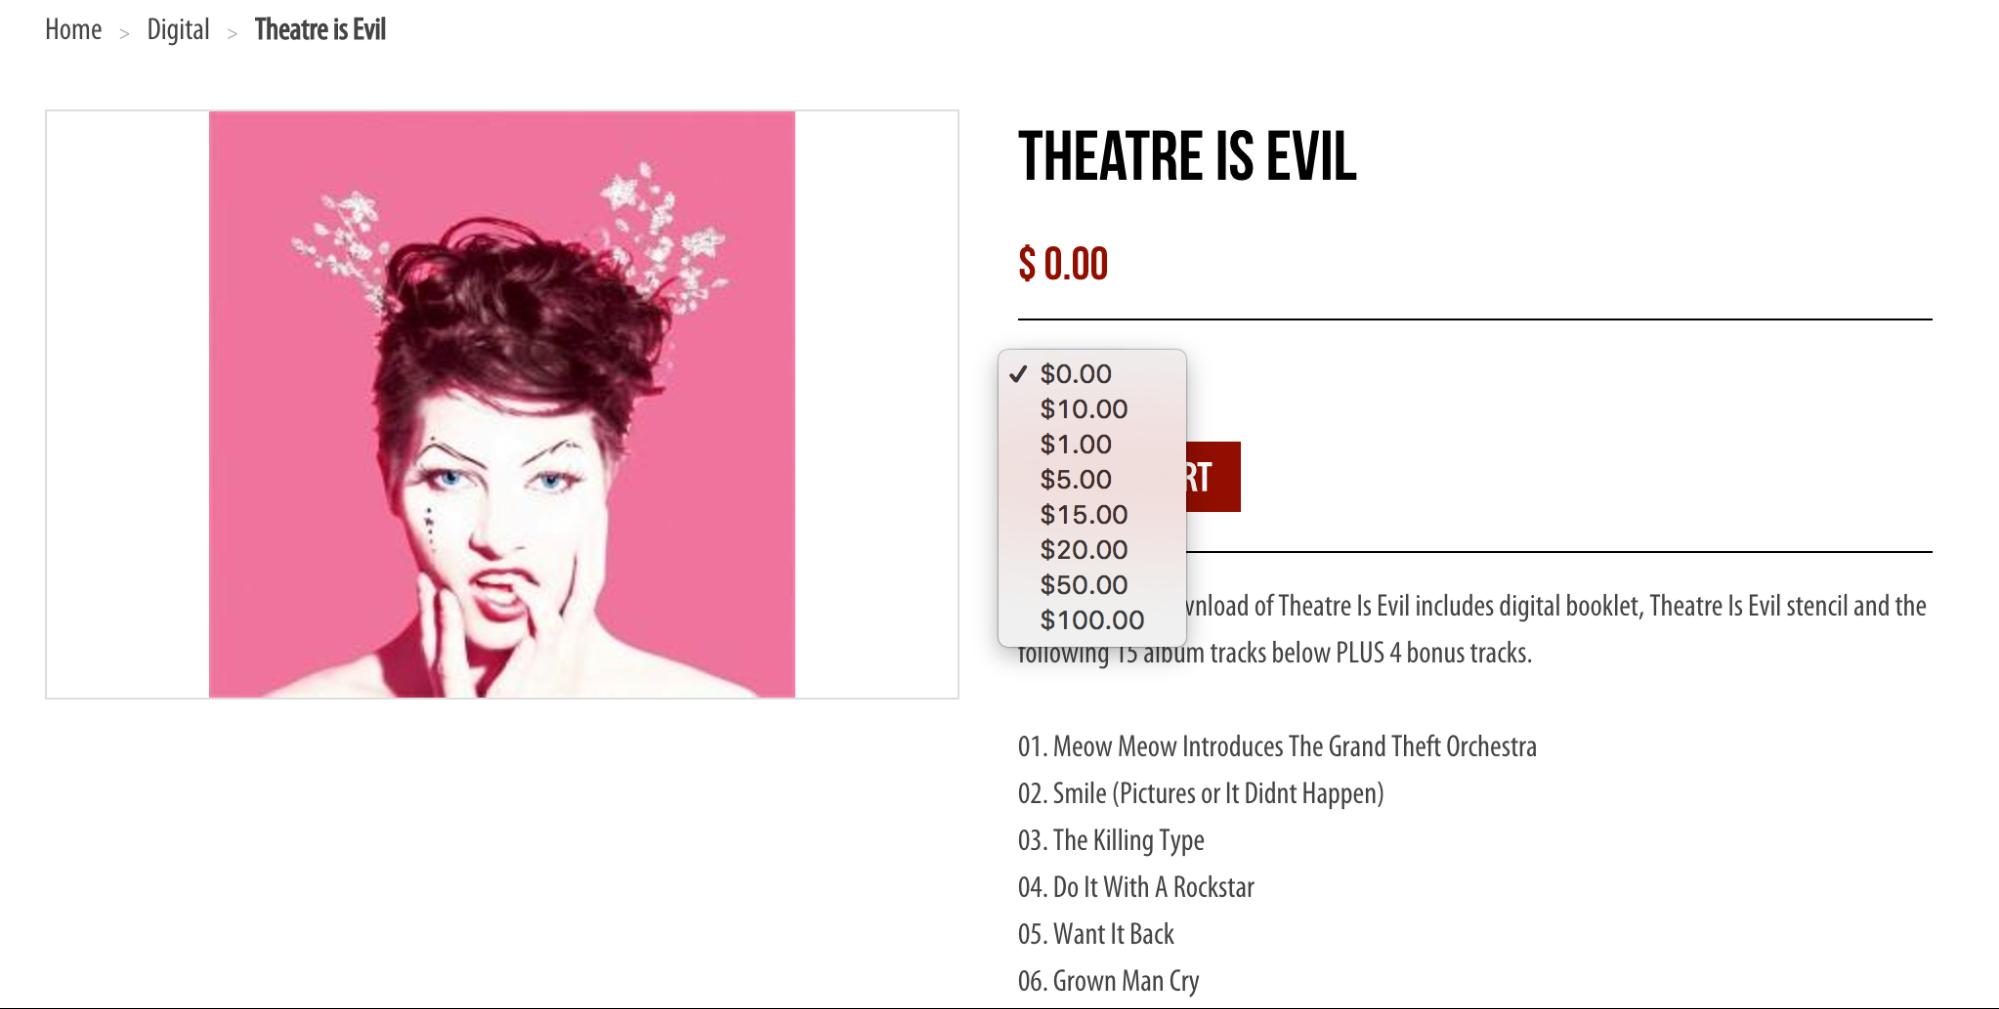 eCommerce tactics: Η Amanda Palmer επιτρέπει στους χρήστες να πληρώσουν ότι επιθυμούν για να κάνουν download τα έργα της